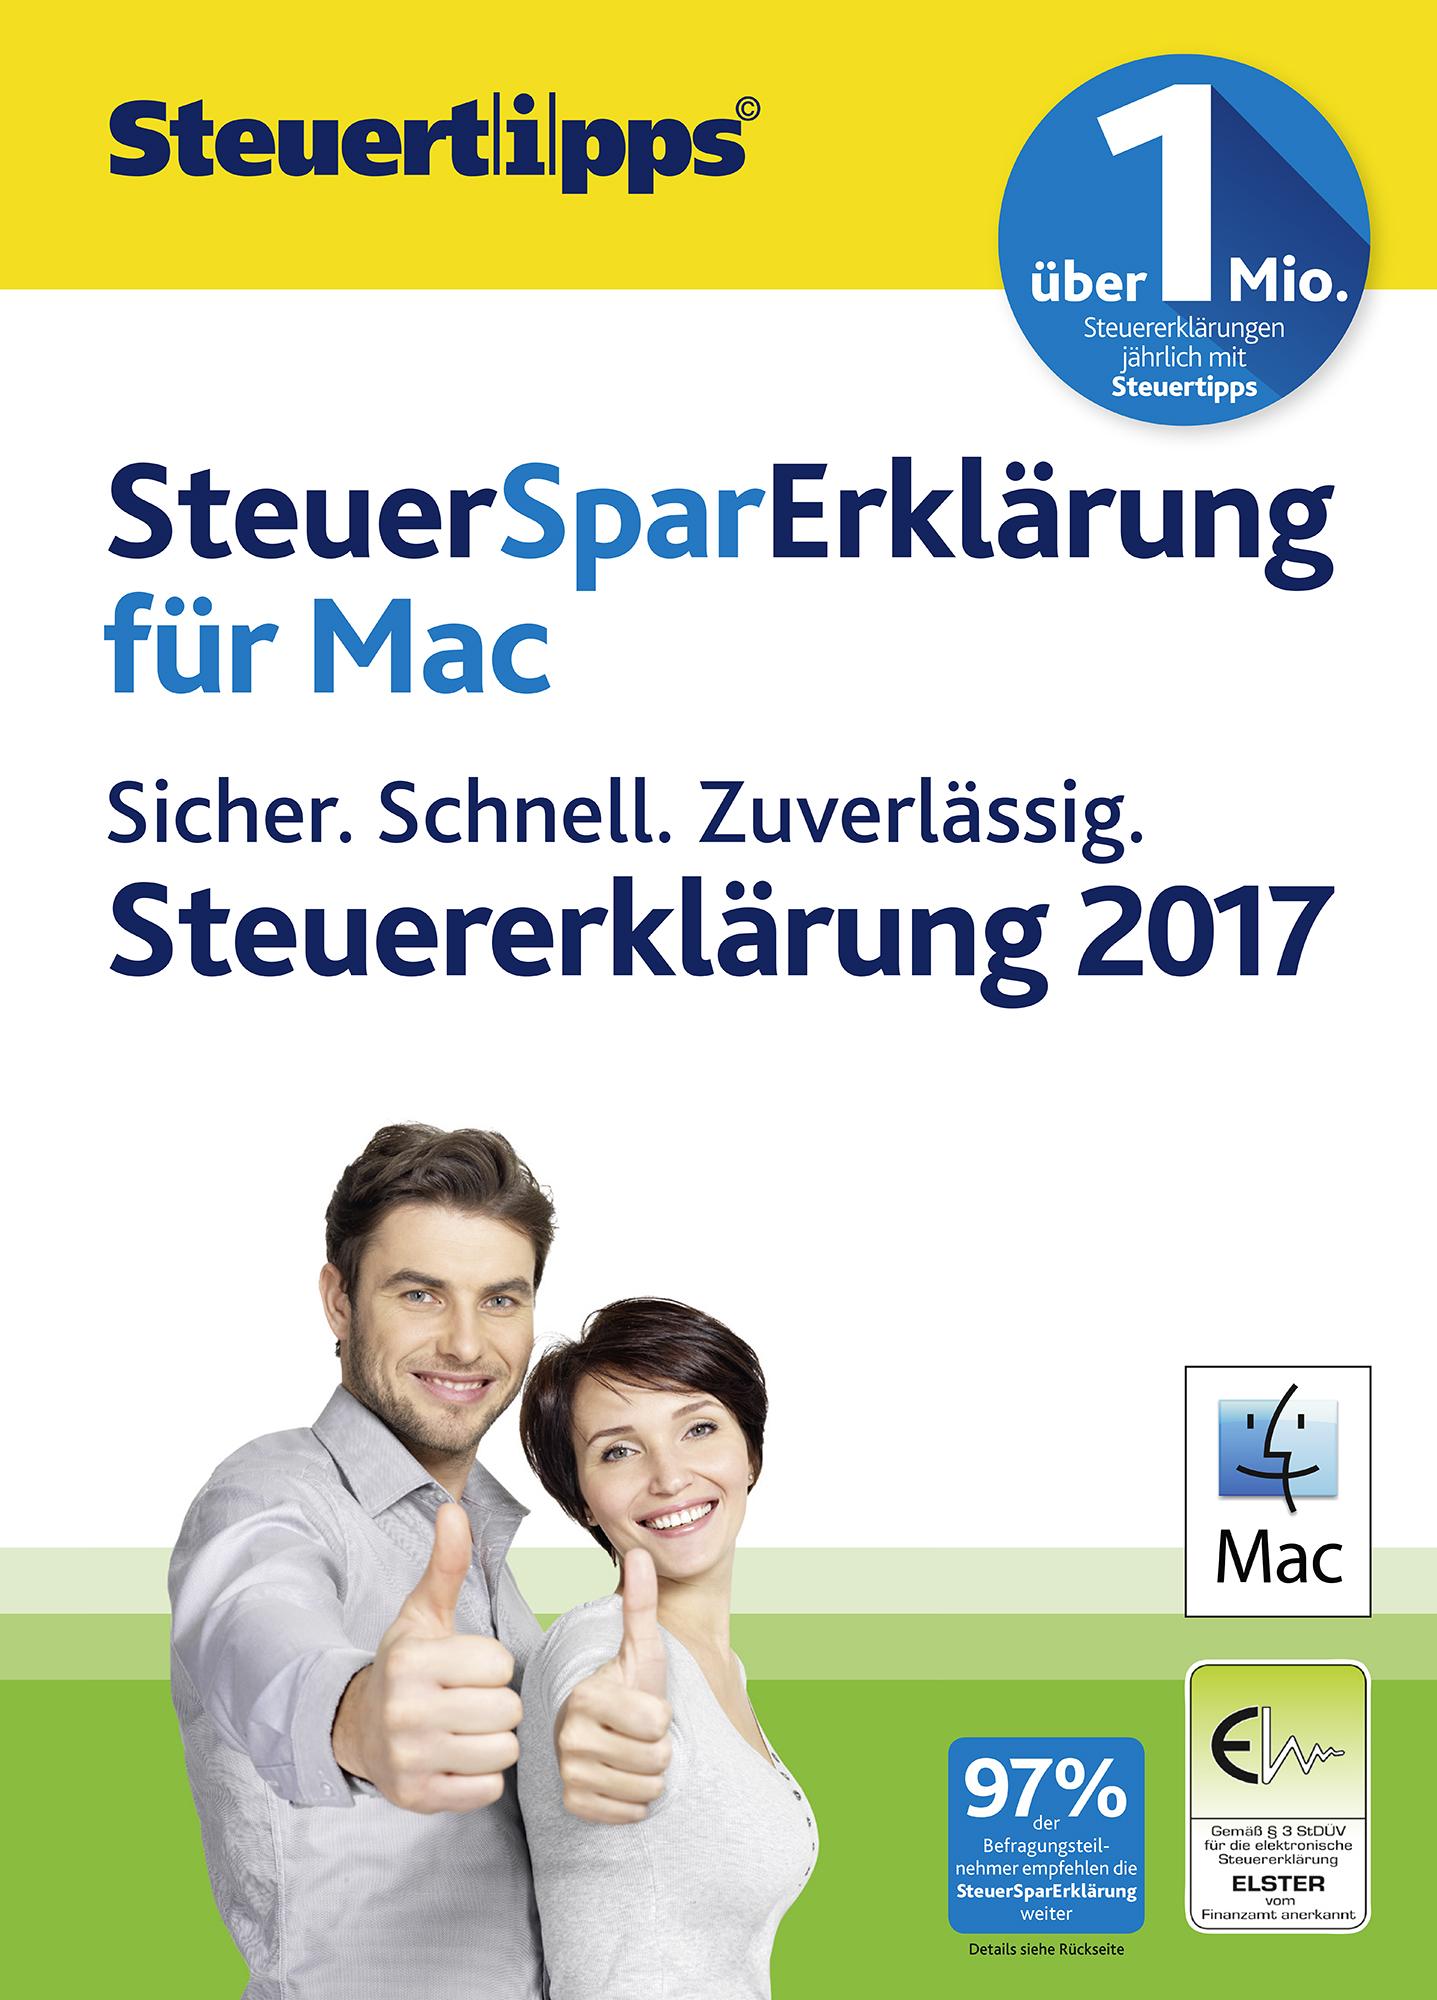 Festsetzung Der Preise Nach ProduktqualitäT 3er-set Sting Paulmann 936.96 Outdoor Plug & Shine 3er-set Spot Sting Basi